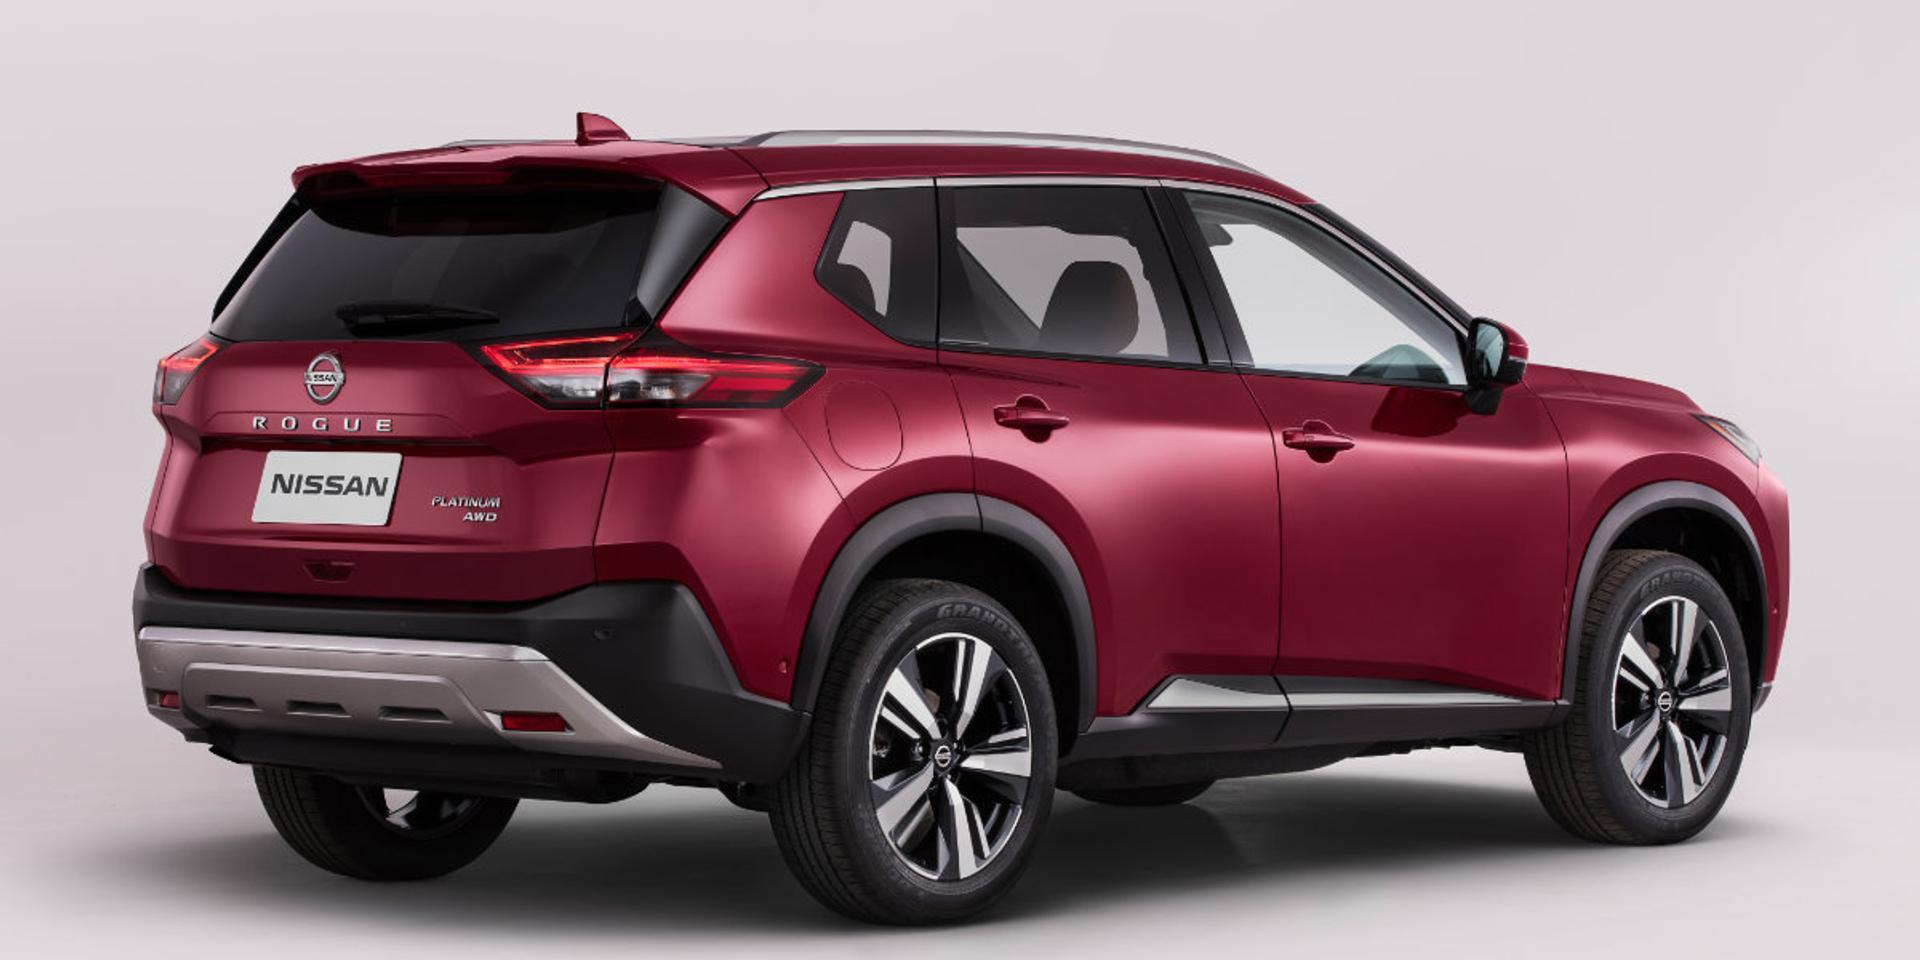 Nissan Rogue rear view